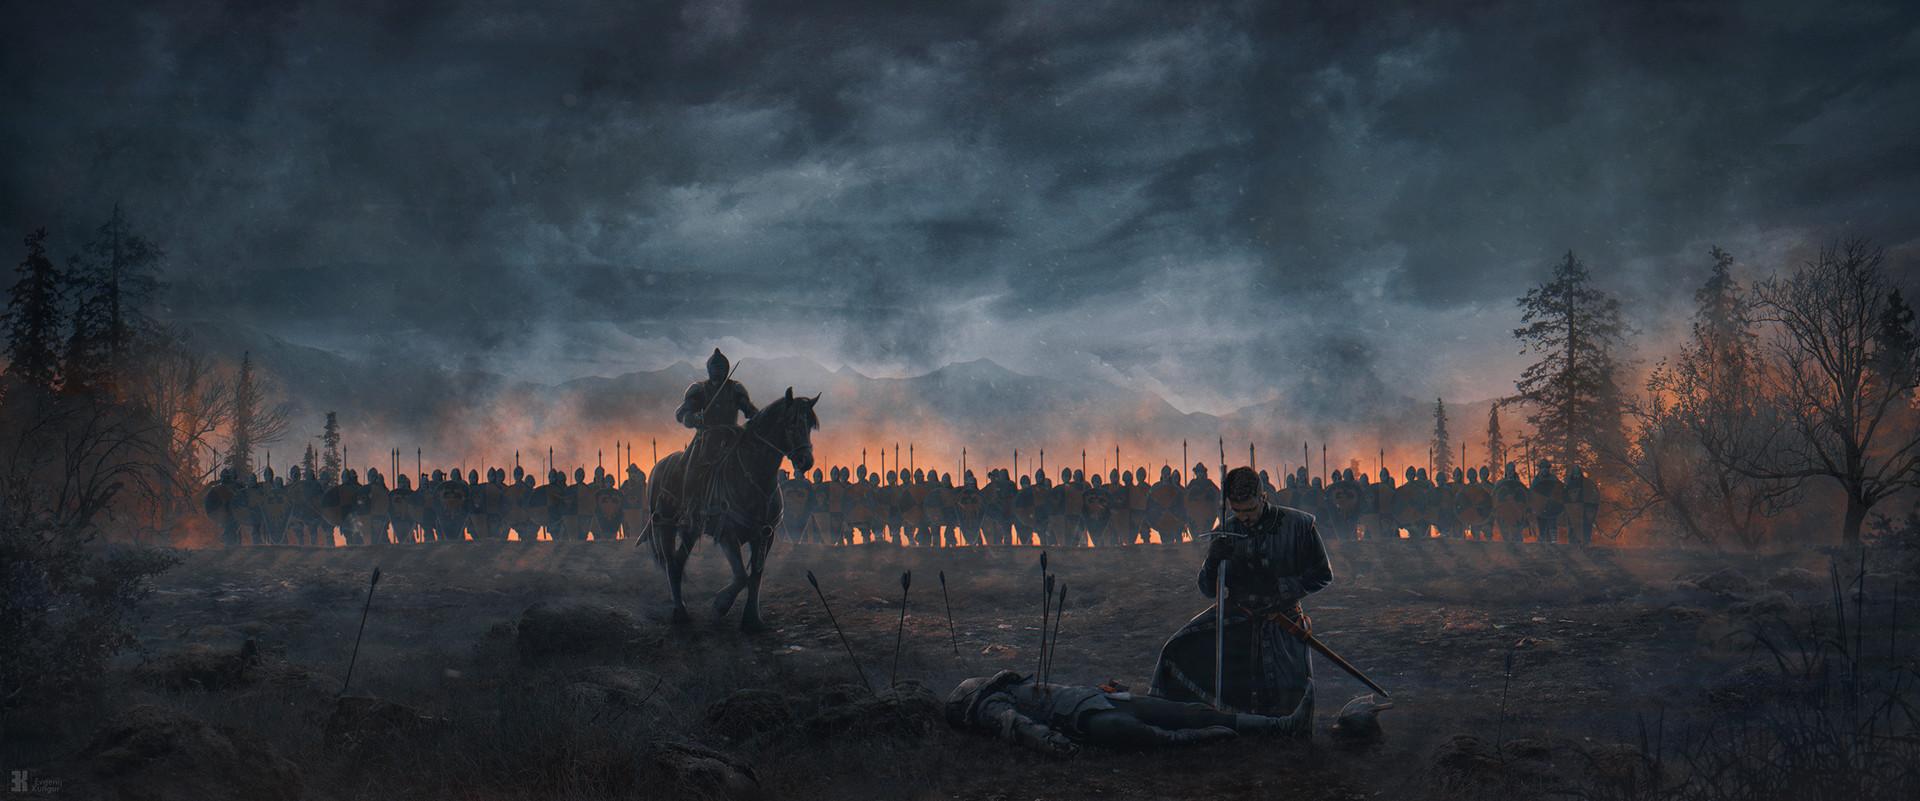 General 1920x801 digital art knight soldier army warrior war horse arrows artwork sword Evgenij Kungur